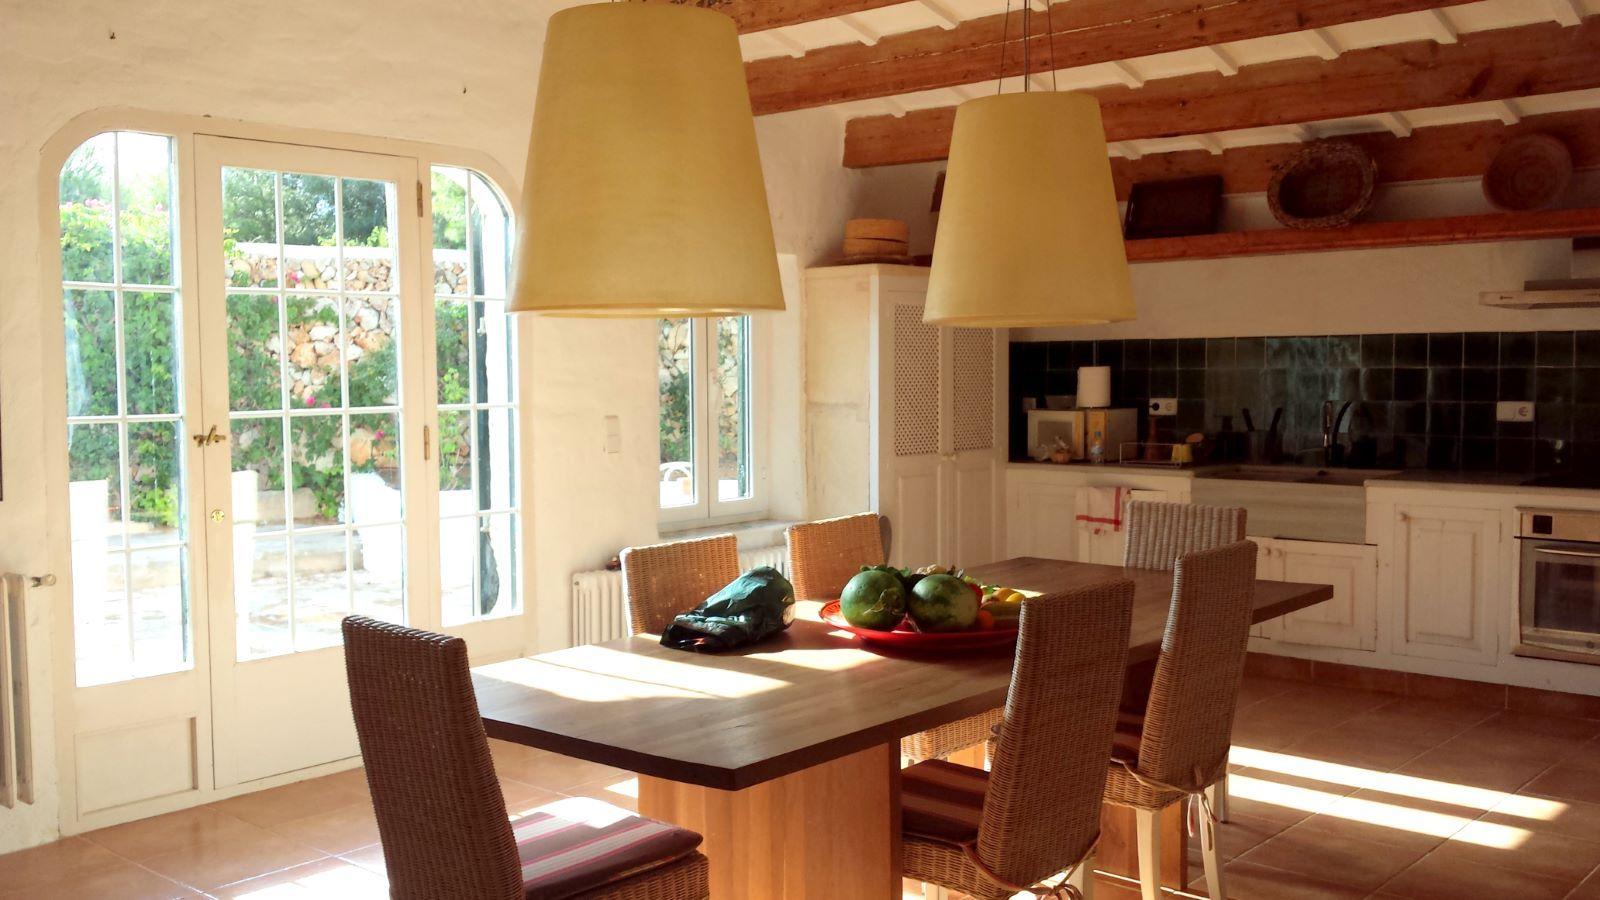 Casa de campo en Biniparrell Ref: S2372 10 | cocinas | Pinterest